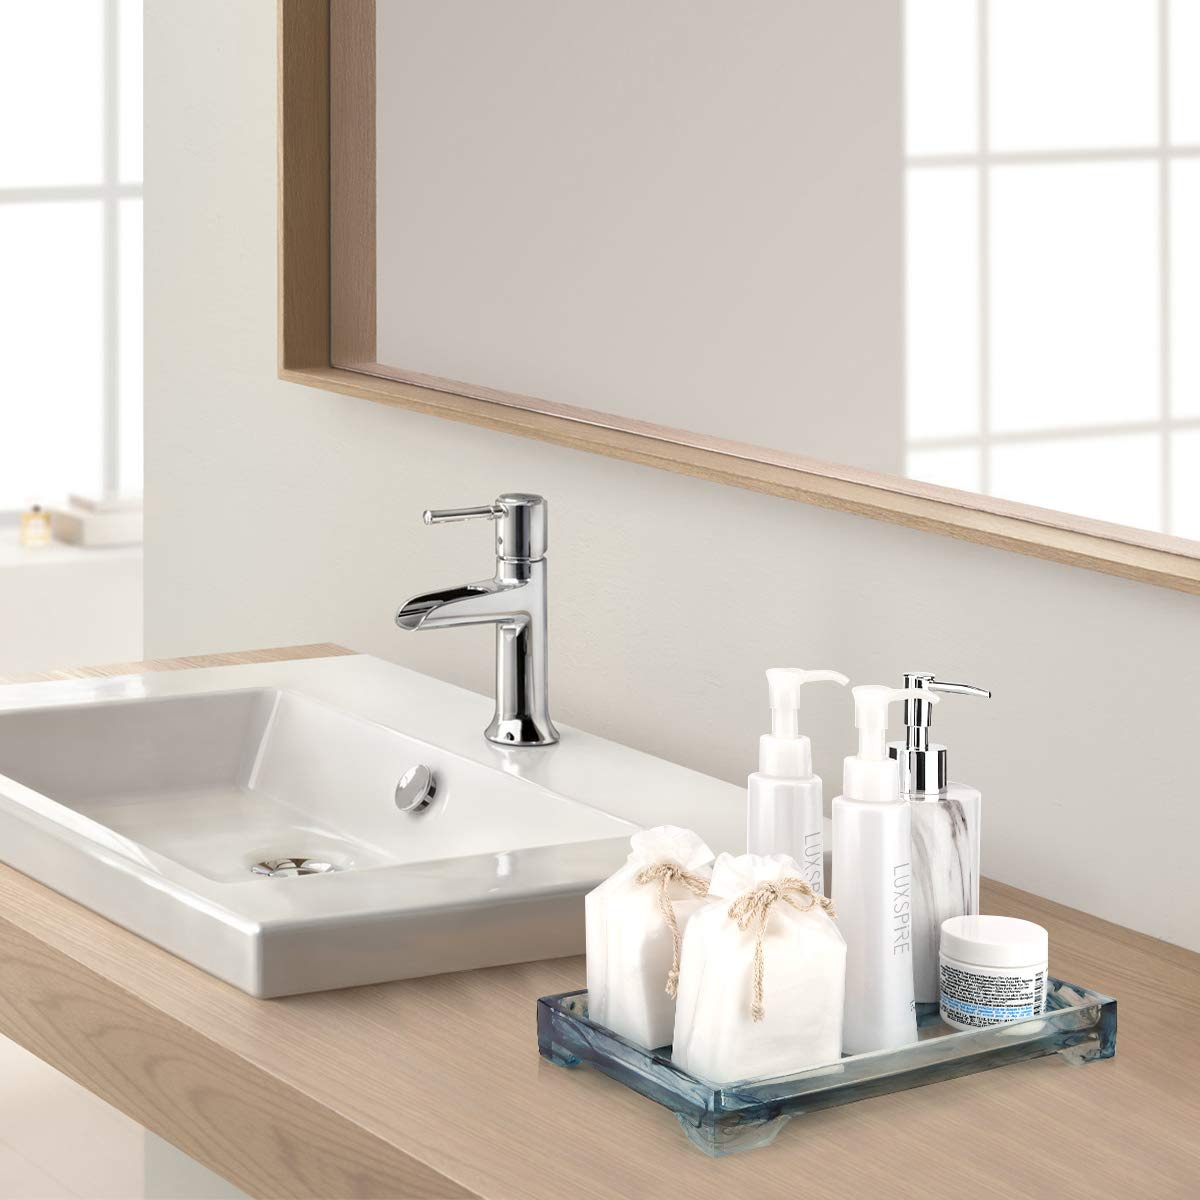 Towel Blue Ink Soap Vanity Organizer for Tissues etc Candles Medium Size Toilet Tank Storage Tray Resin Bathtub Tray Bathroom Tray Marble Pattern Tray Luxspire Vanity Tray Plant